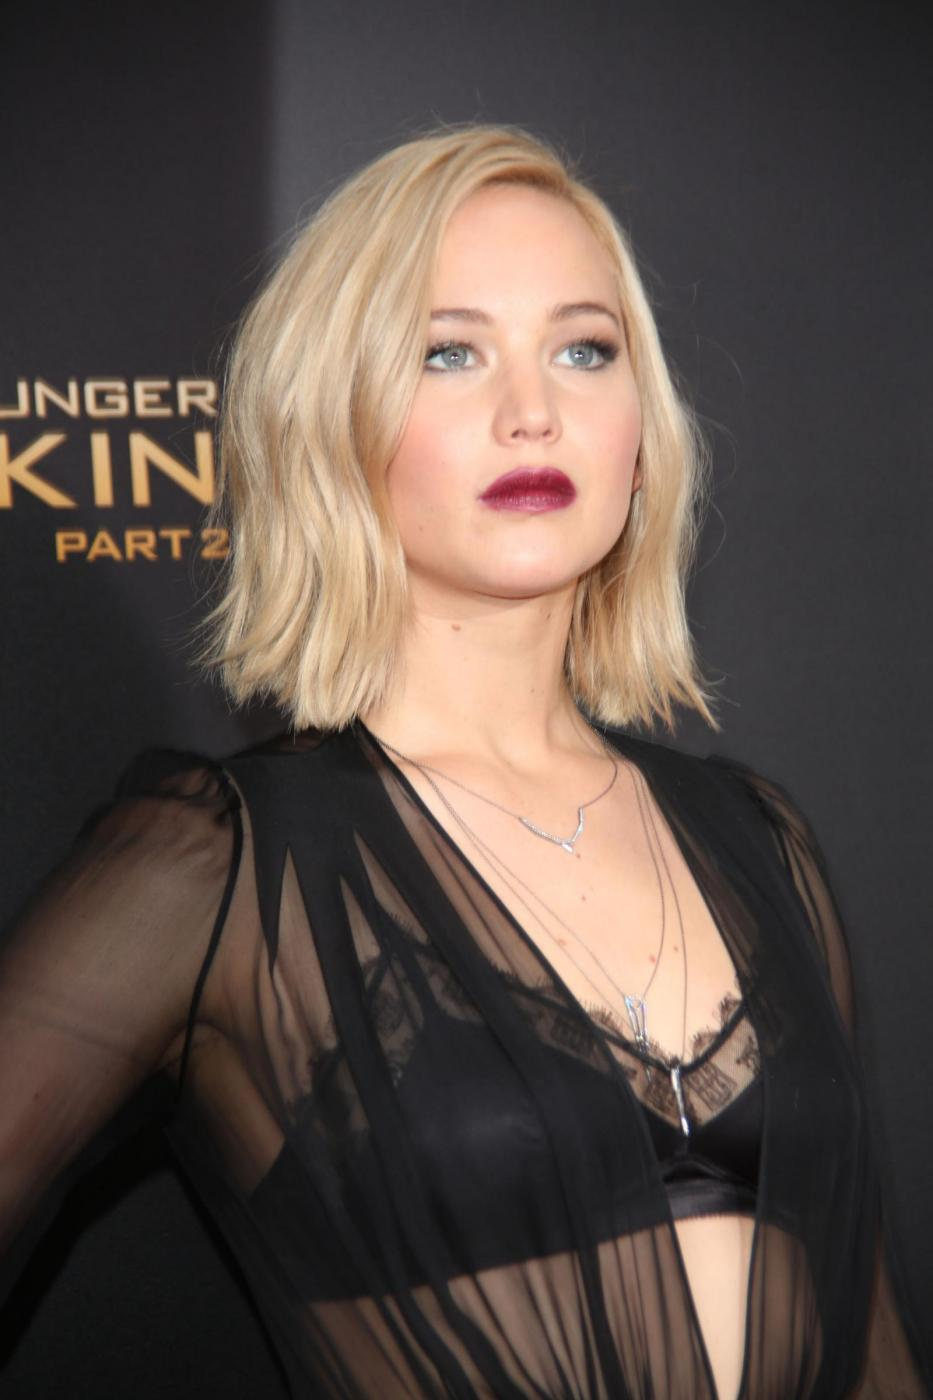 Jennifer Lawrence: reggiseno in bella vista a New York FOTO gg